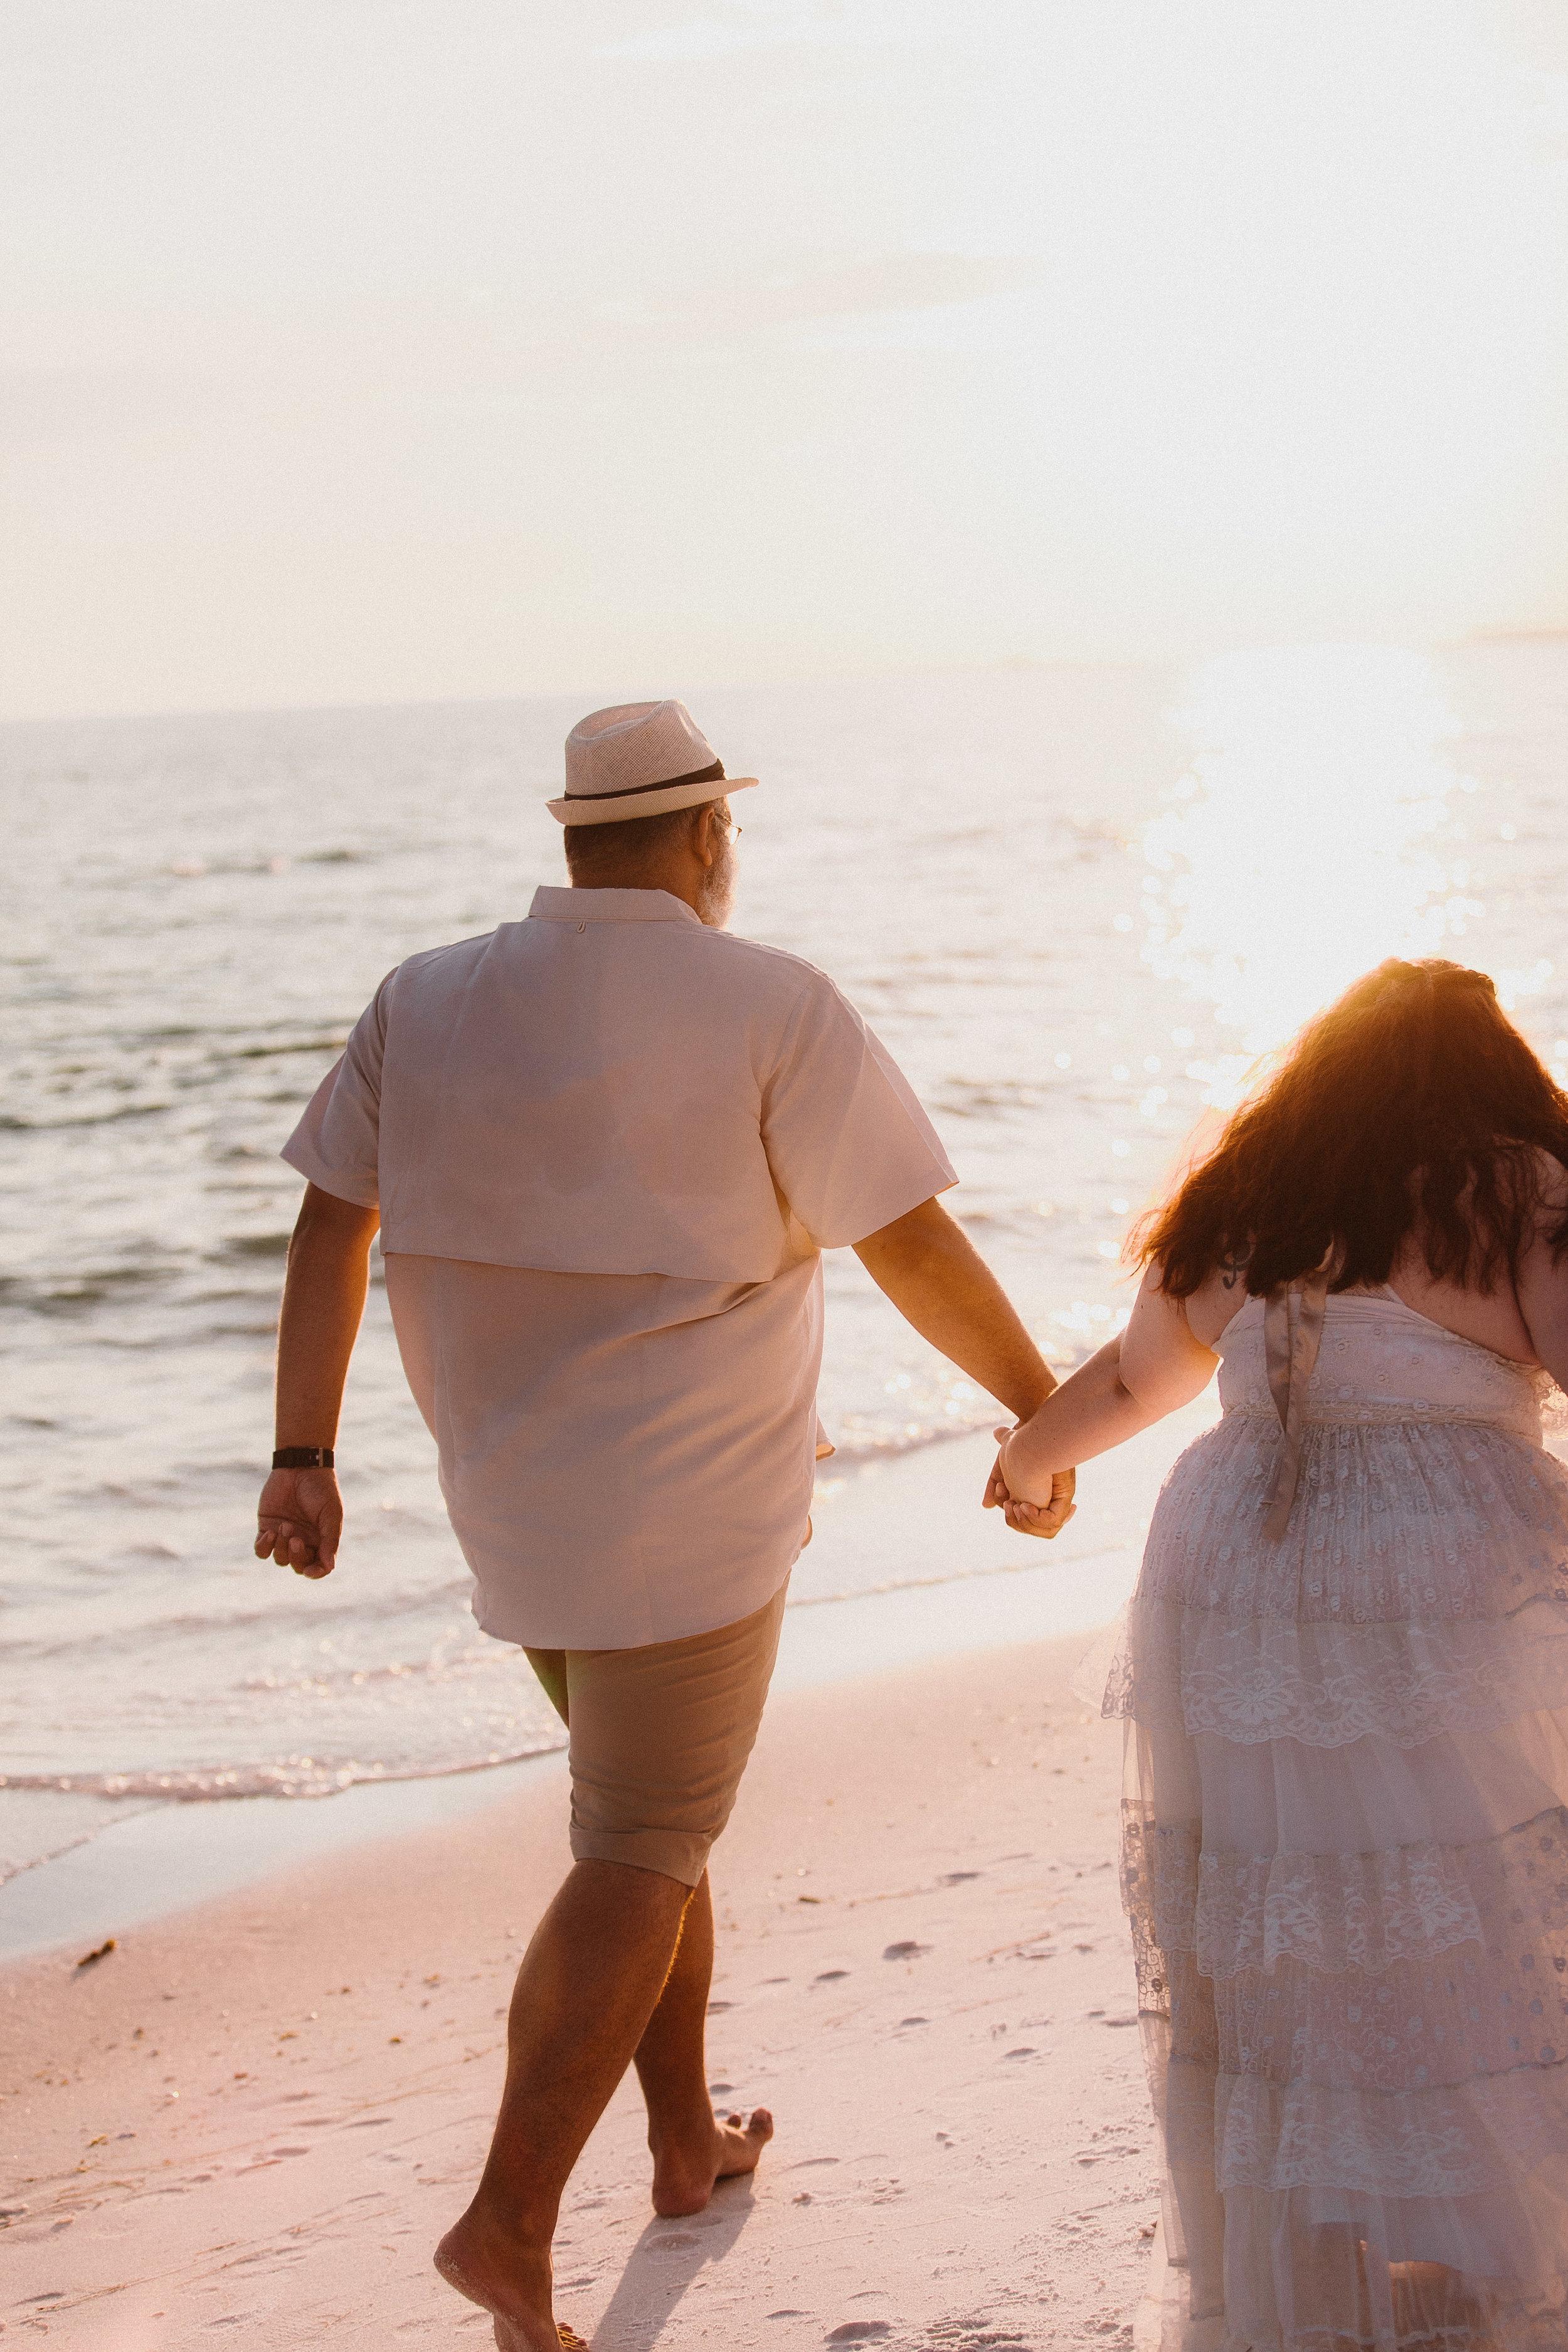 destin_sunset_beach_elopement_intimate_wedding_photographer_florida_documentary_1251.jpg